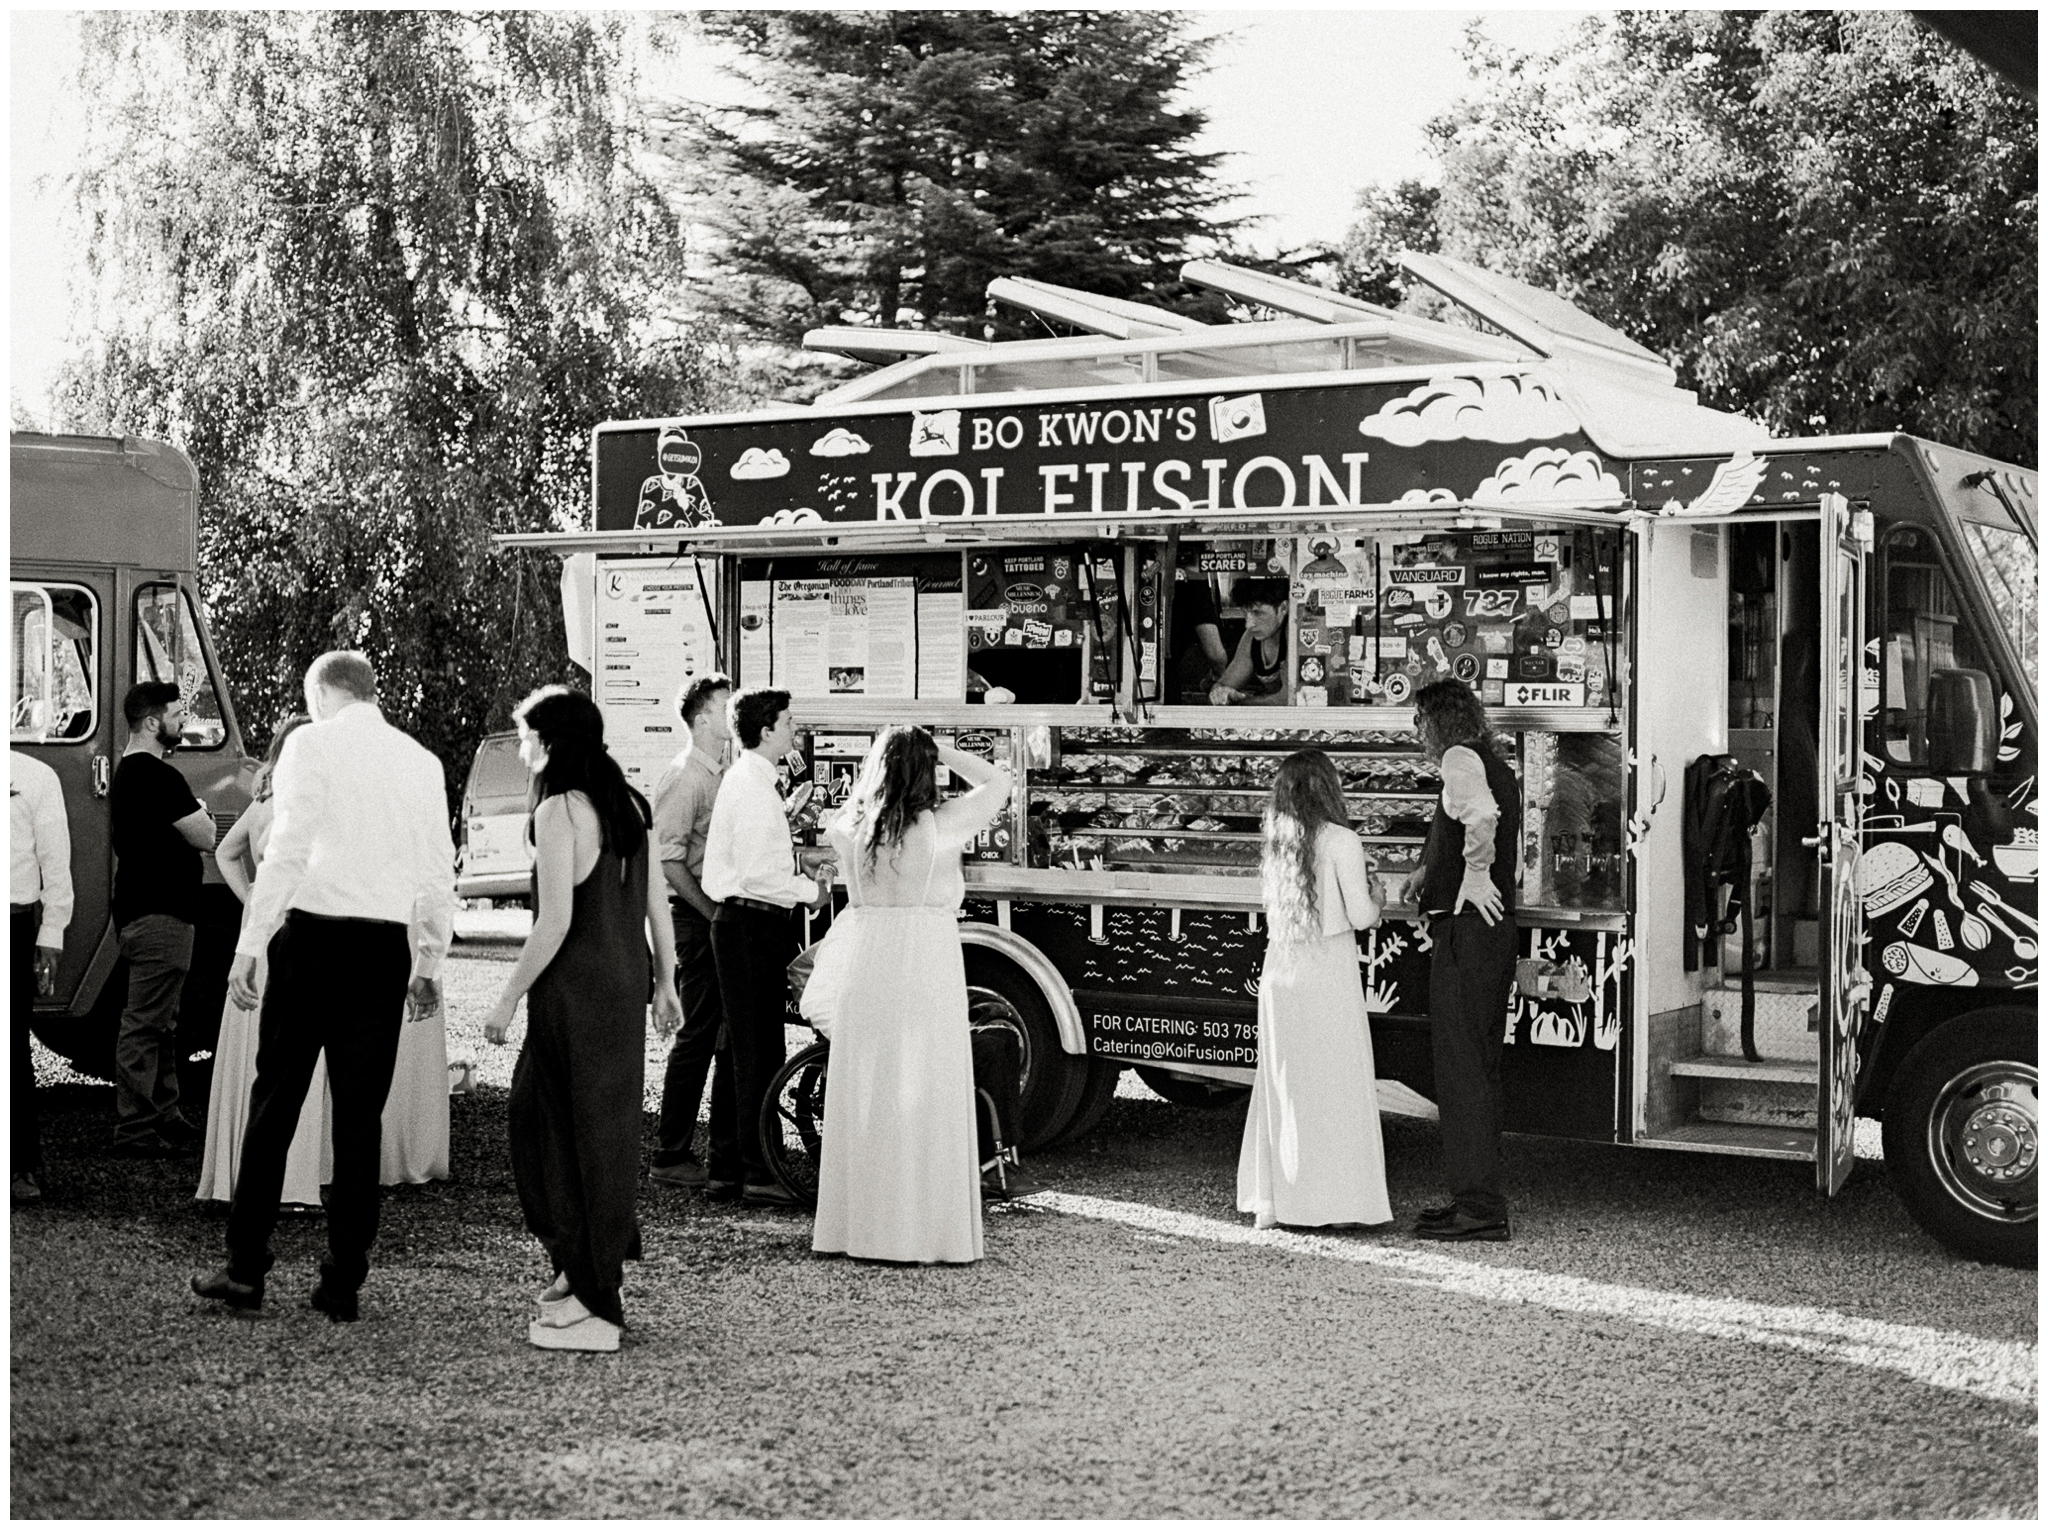 koi fusion food truck